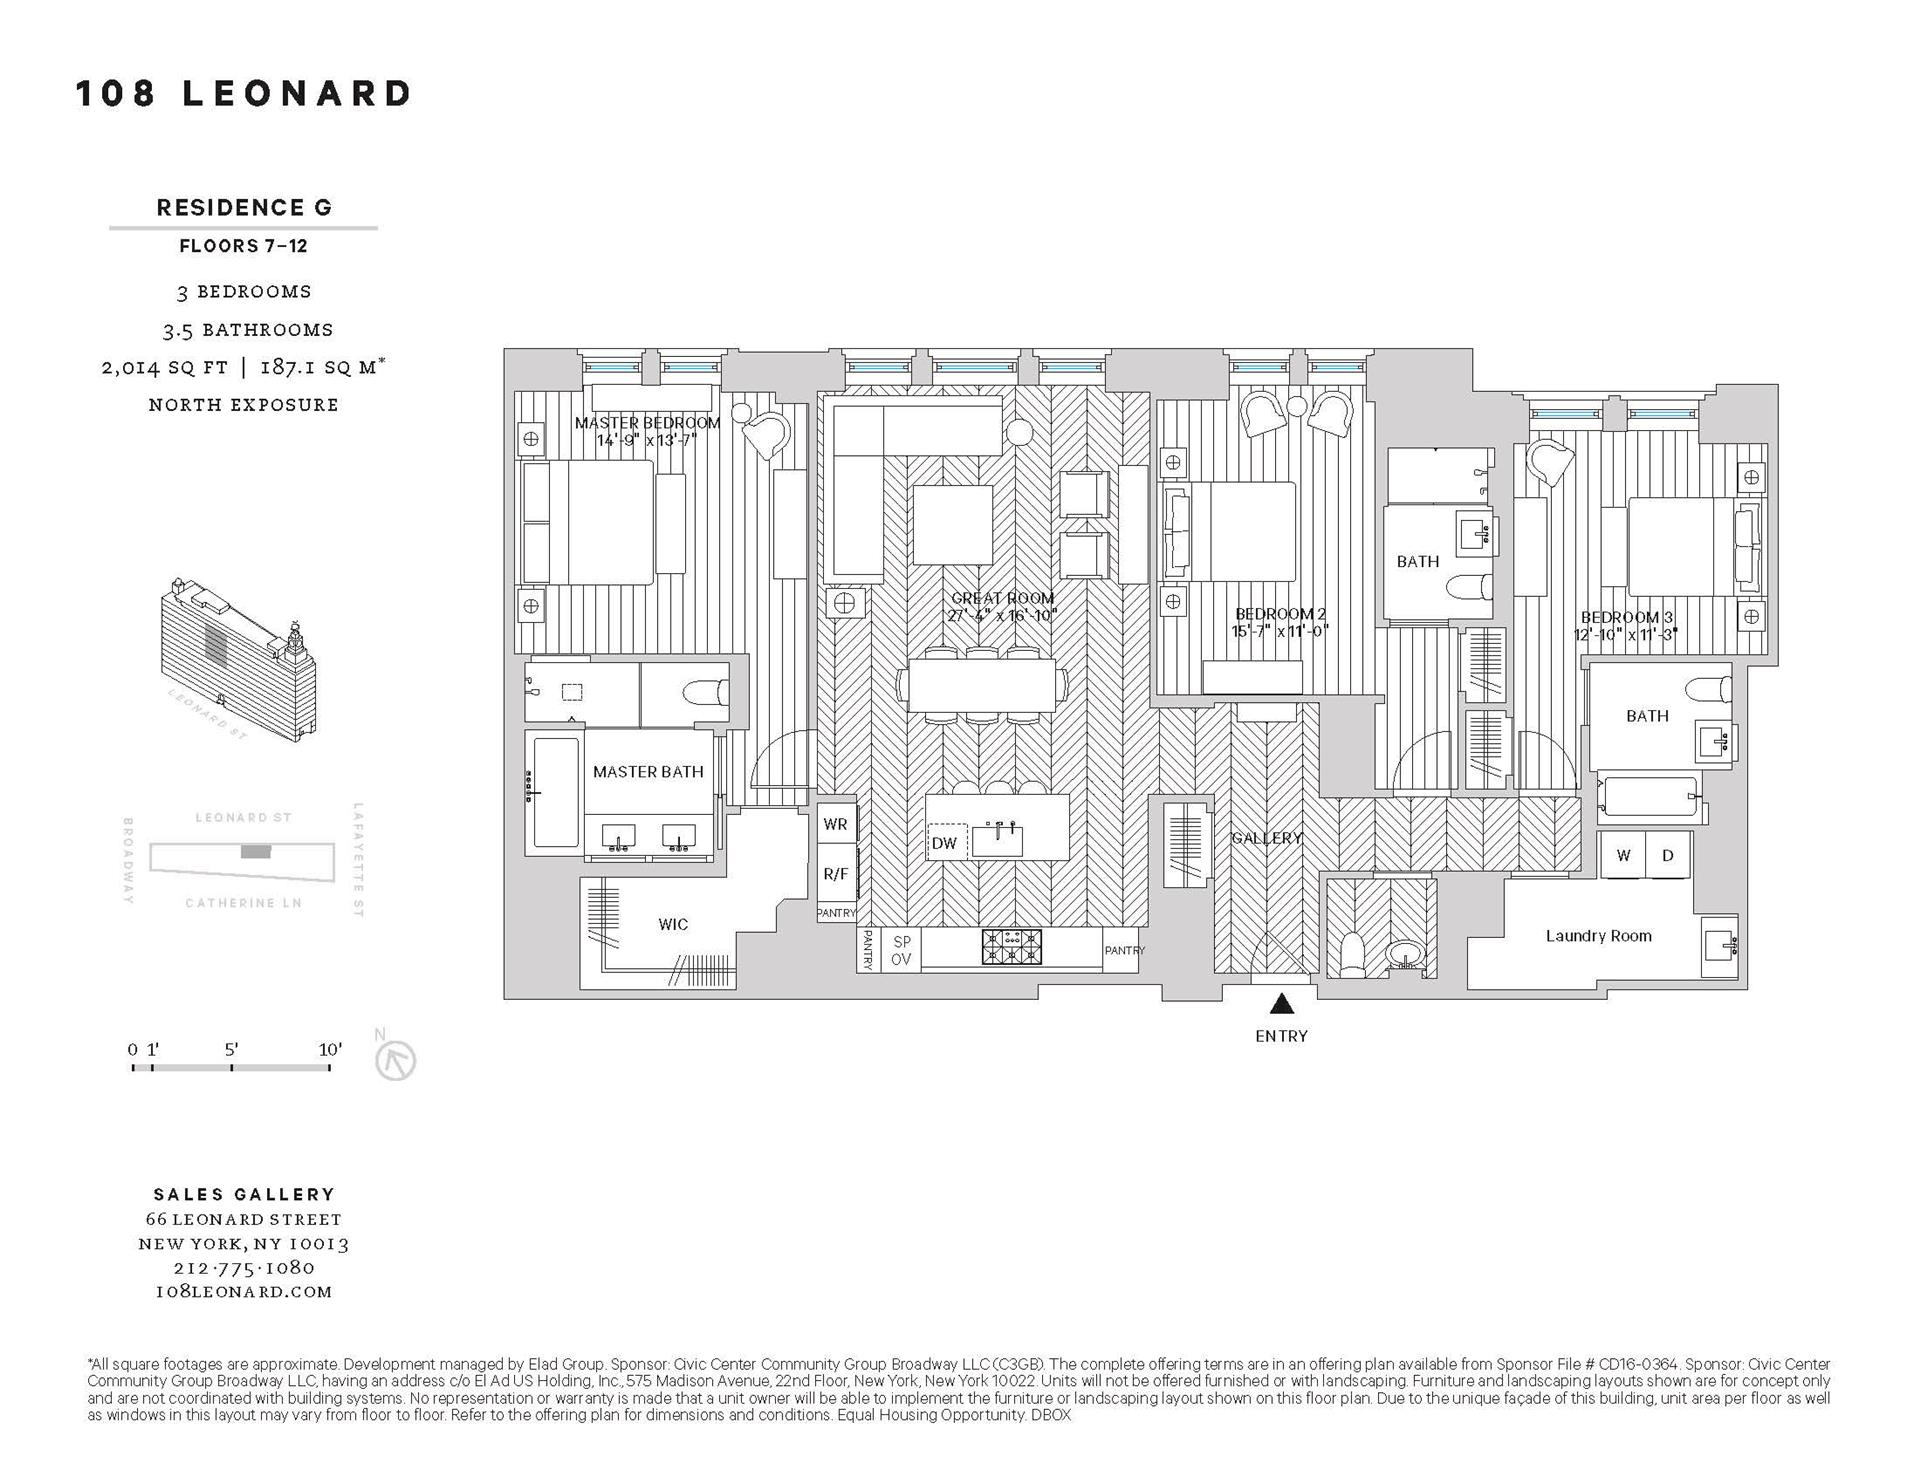 Floor plan of 108 Leonard St, 9G - TriBeCa, New York